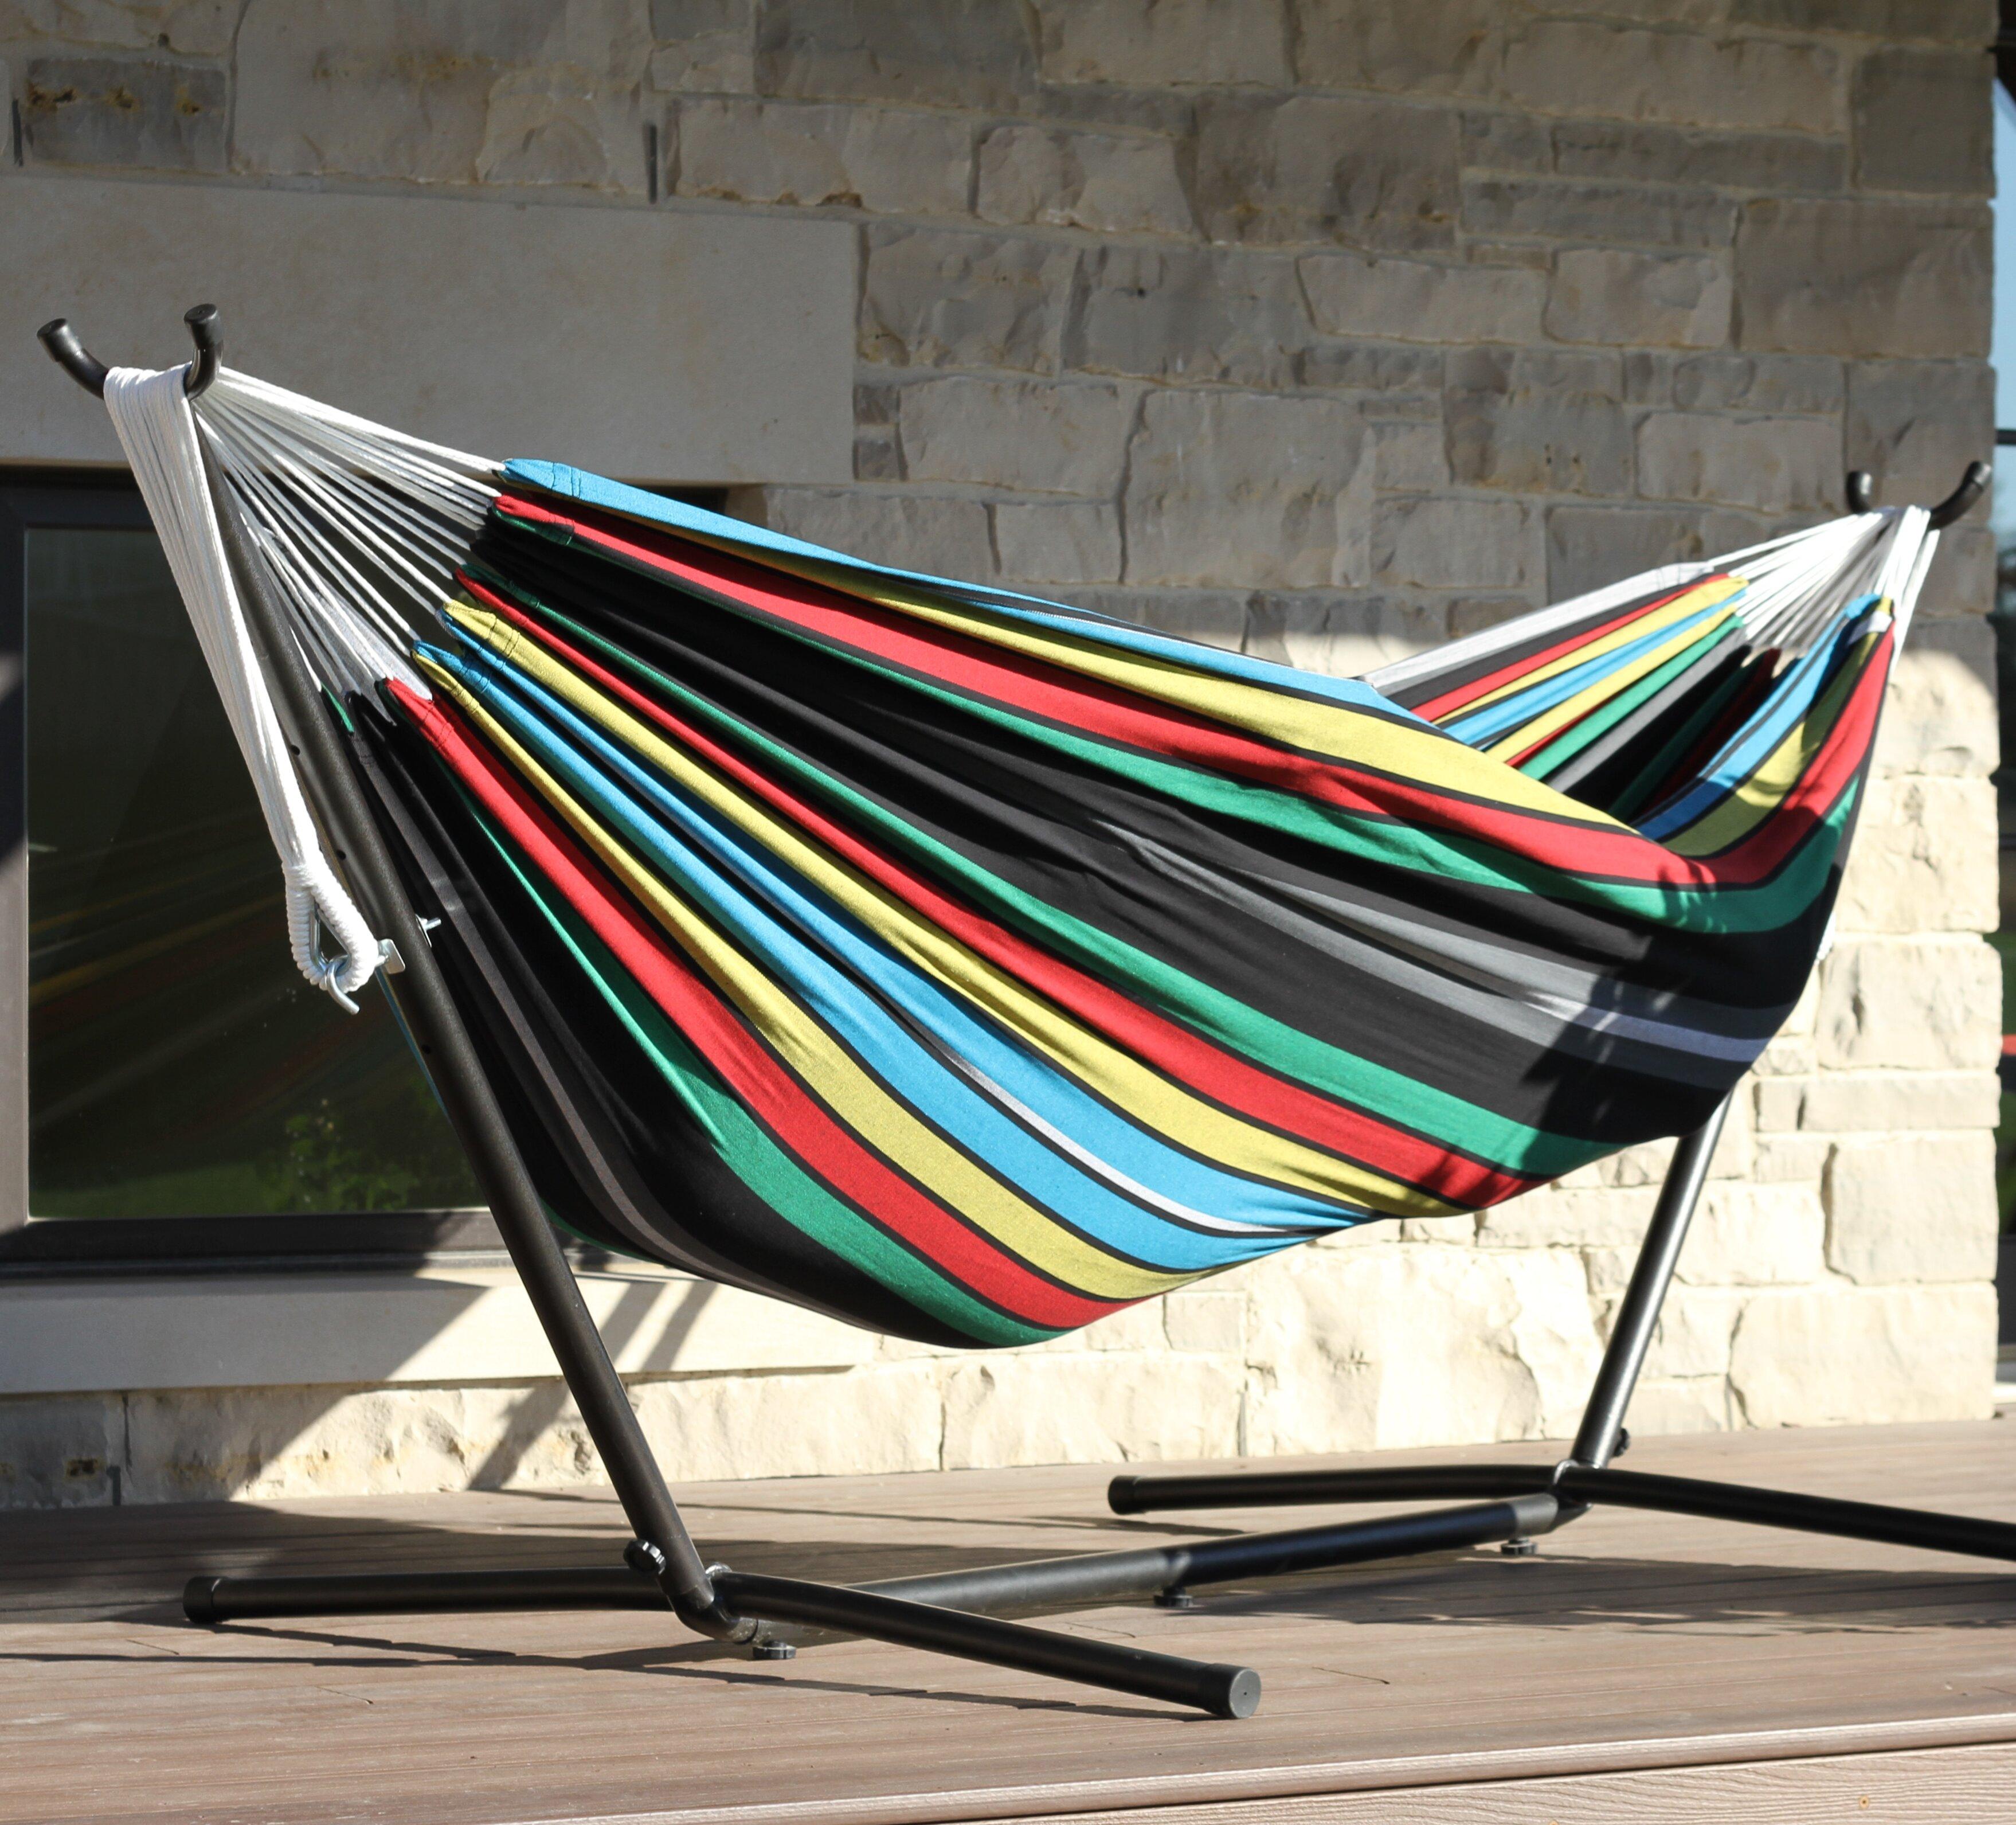 metal diy etsustore alone cheap tire canadian chair amazon hammock com stand swing indoor